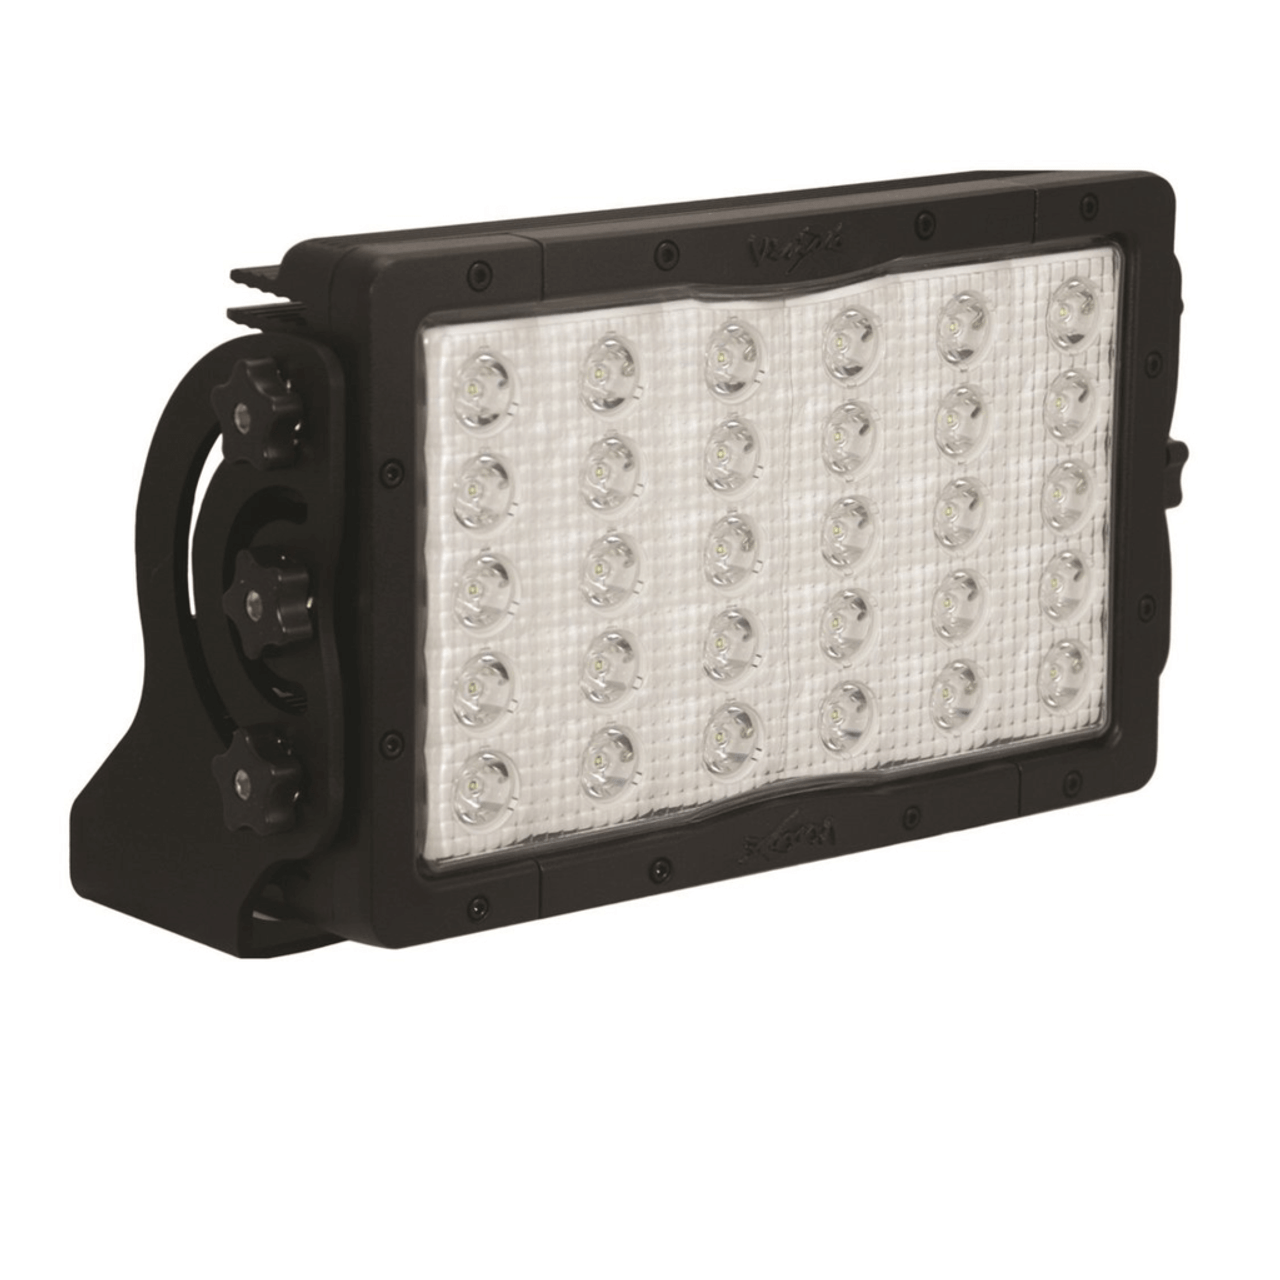 Vision X Pit Master Extreme LED Wide Industrial Flood Light